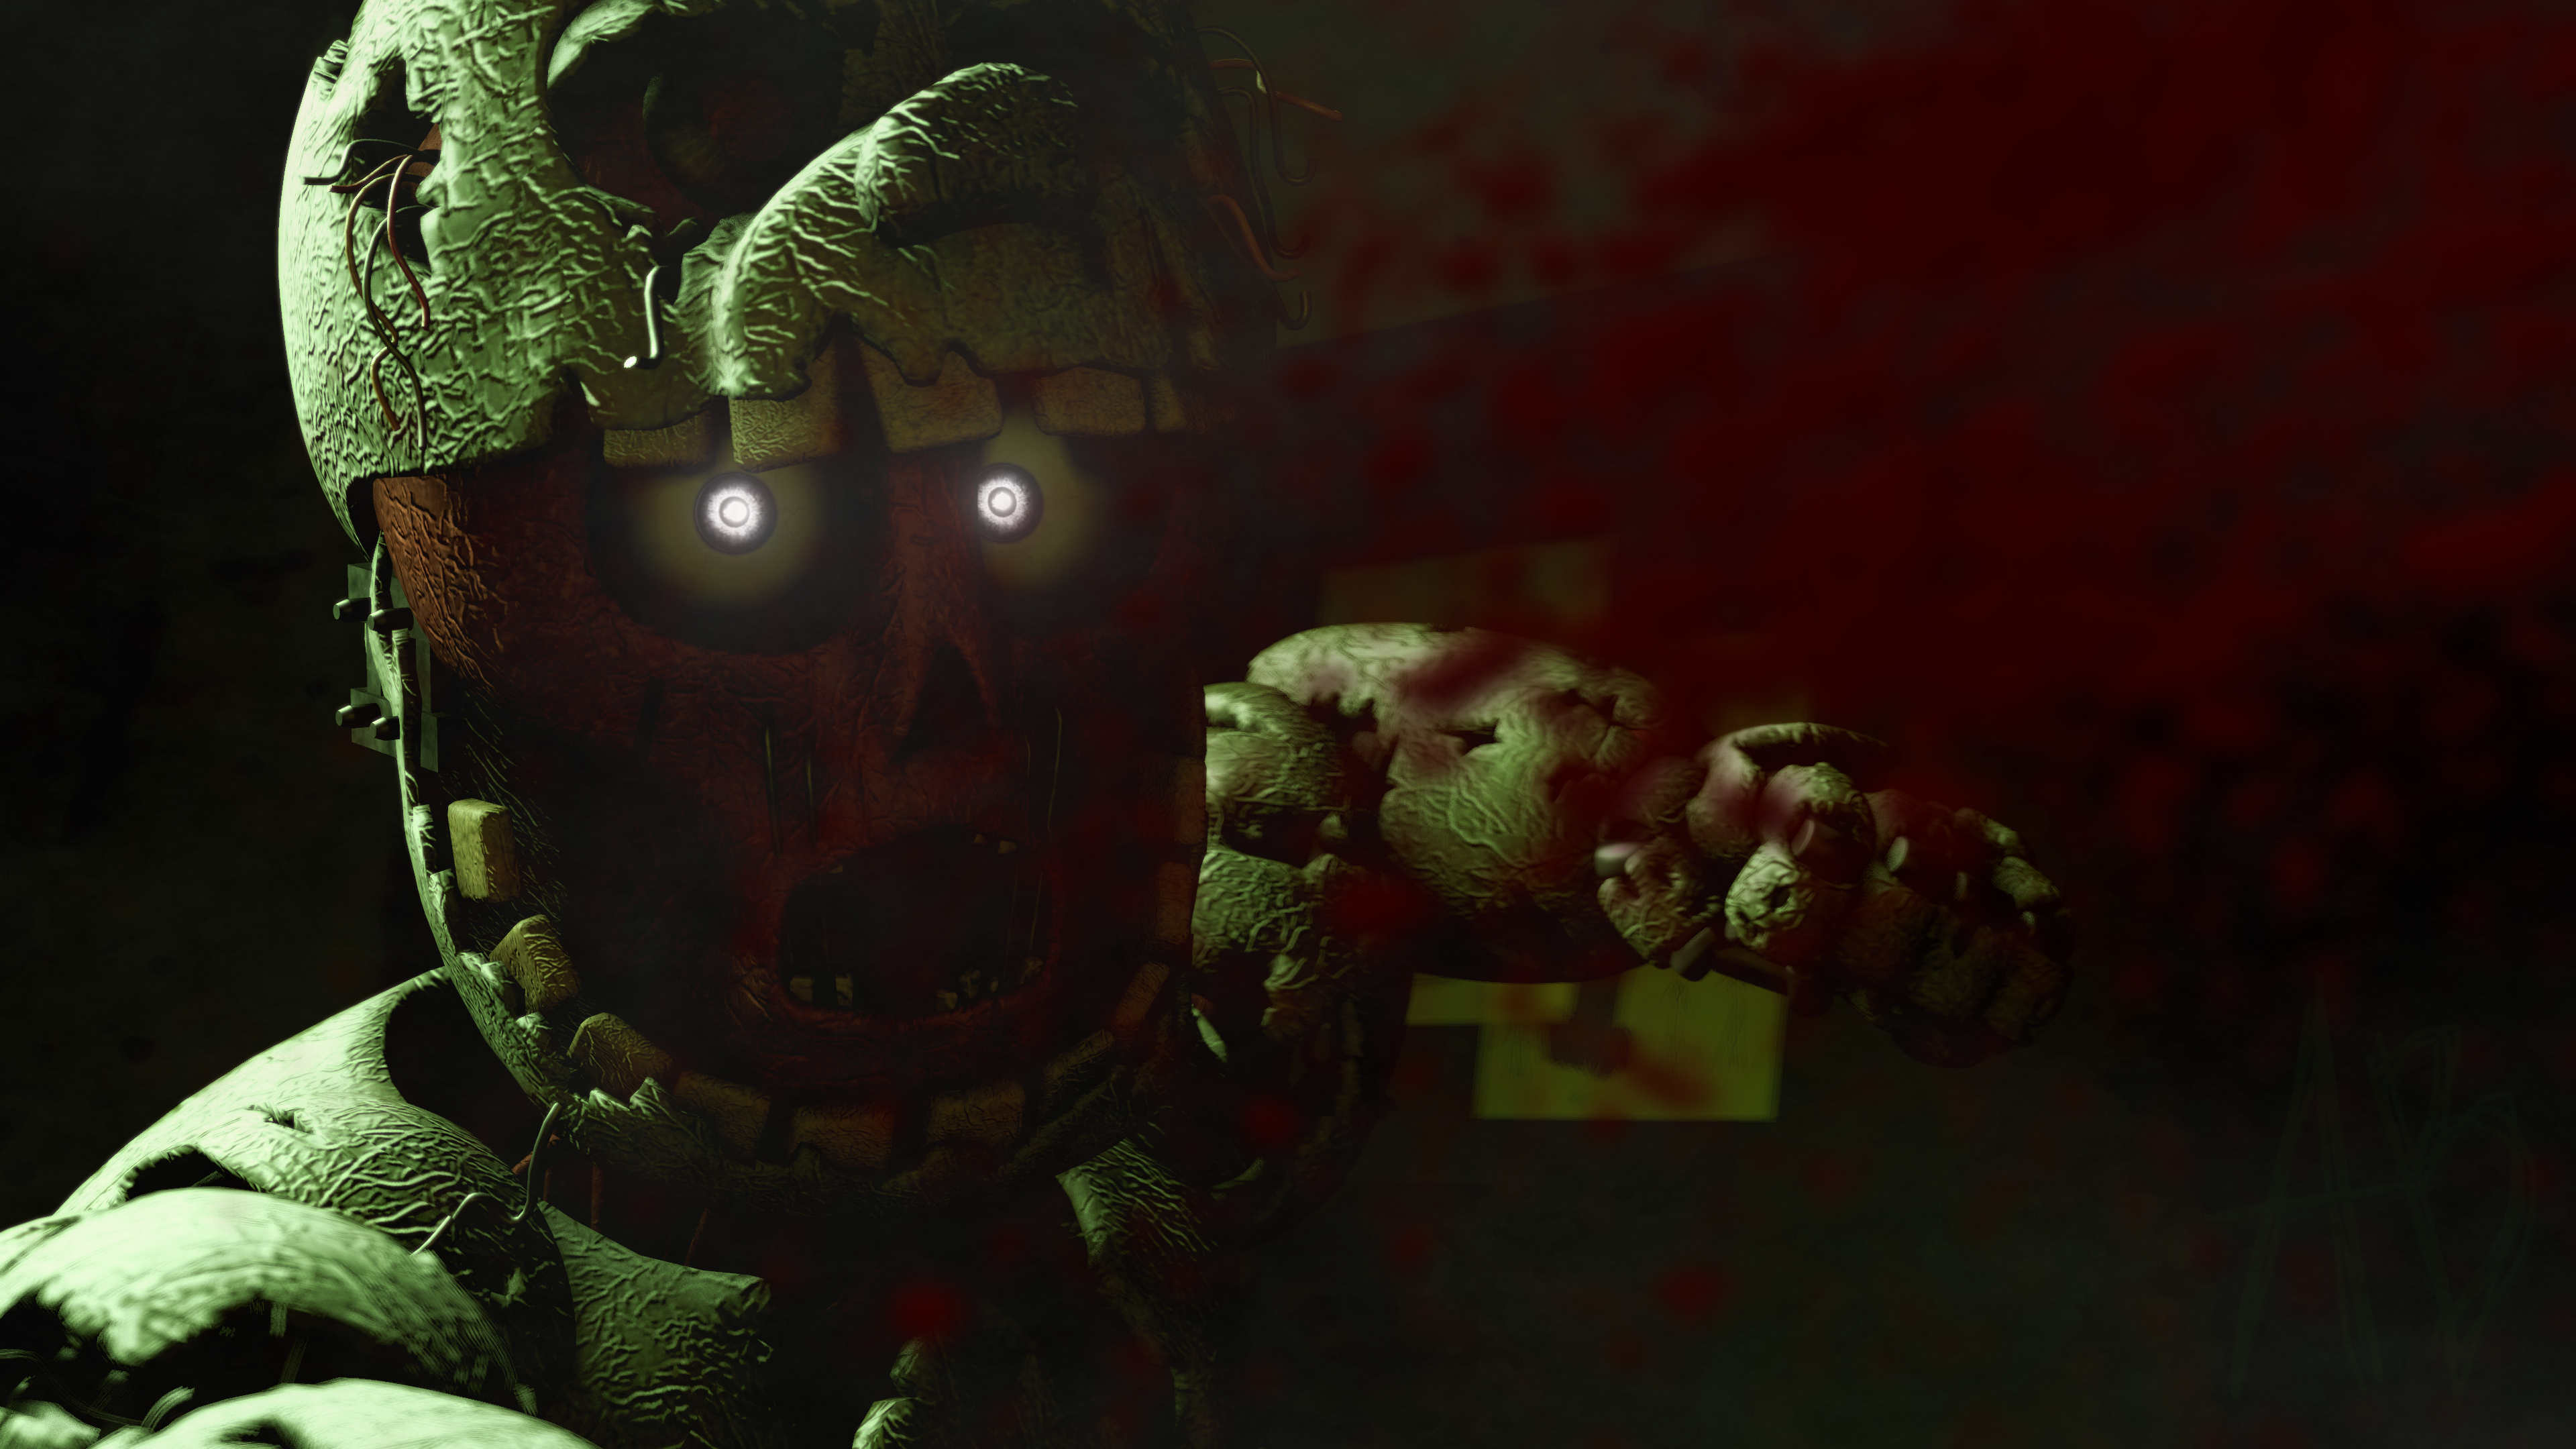 Free Download Five Nights At Freddys 3 4k Ultra Hd Wallpaper